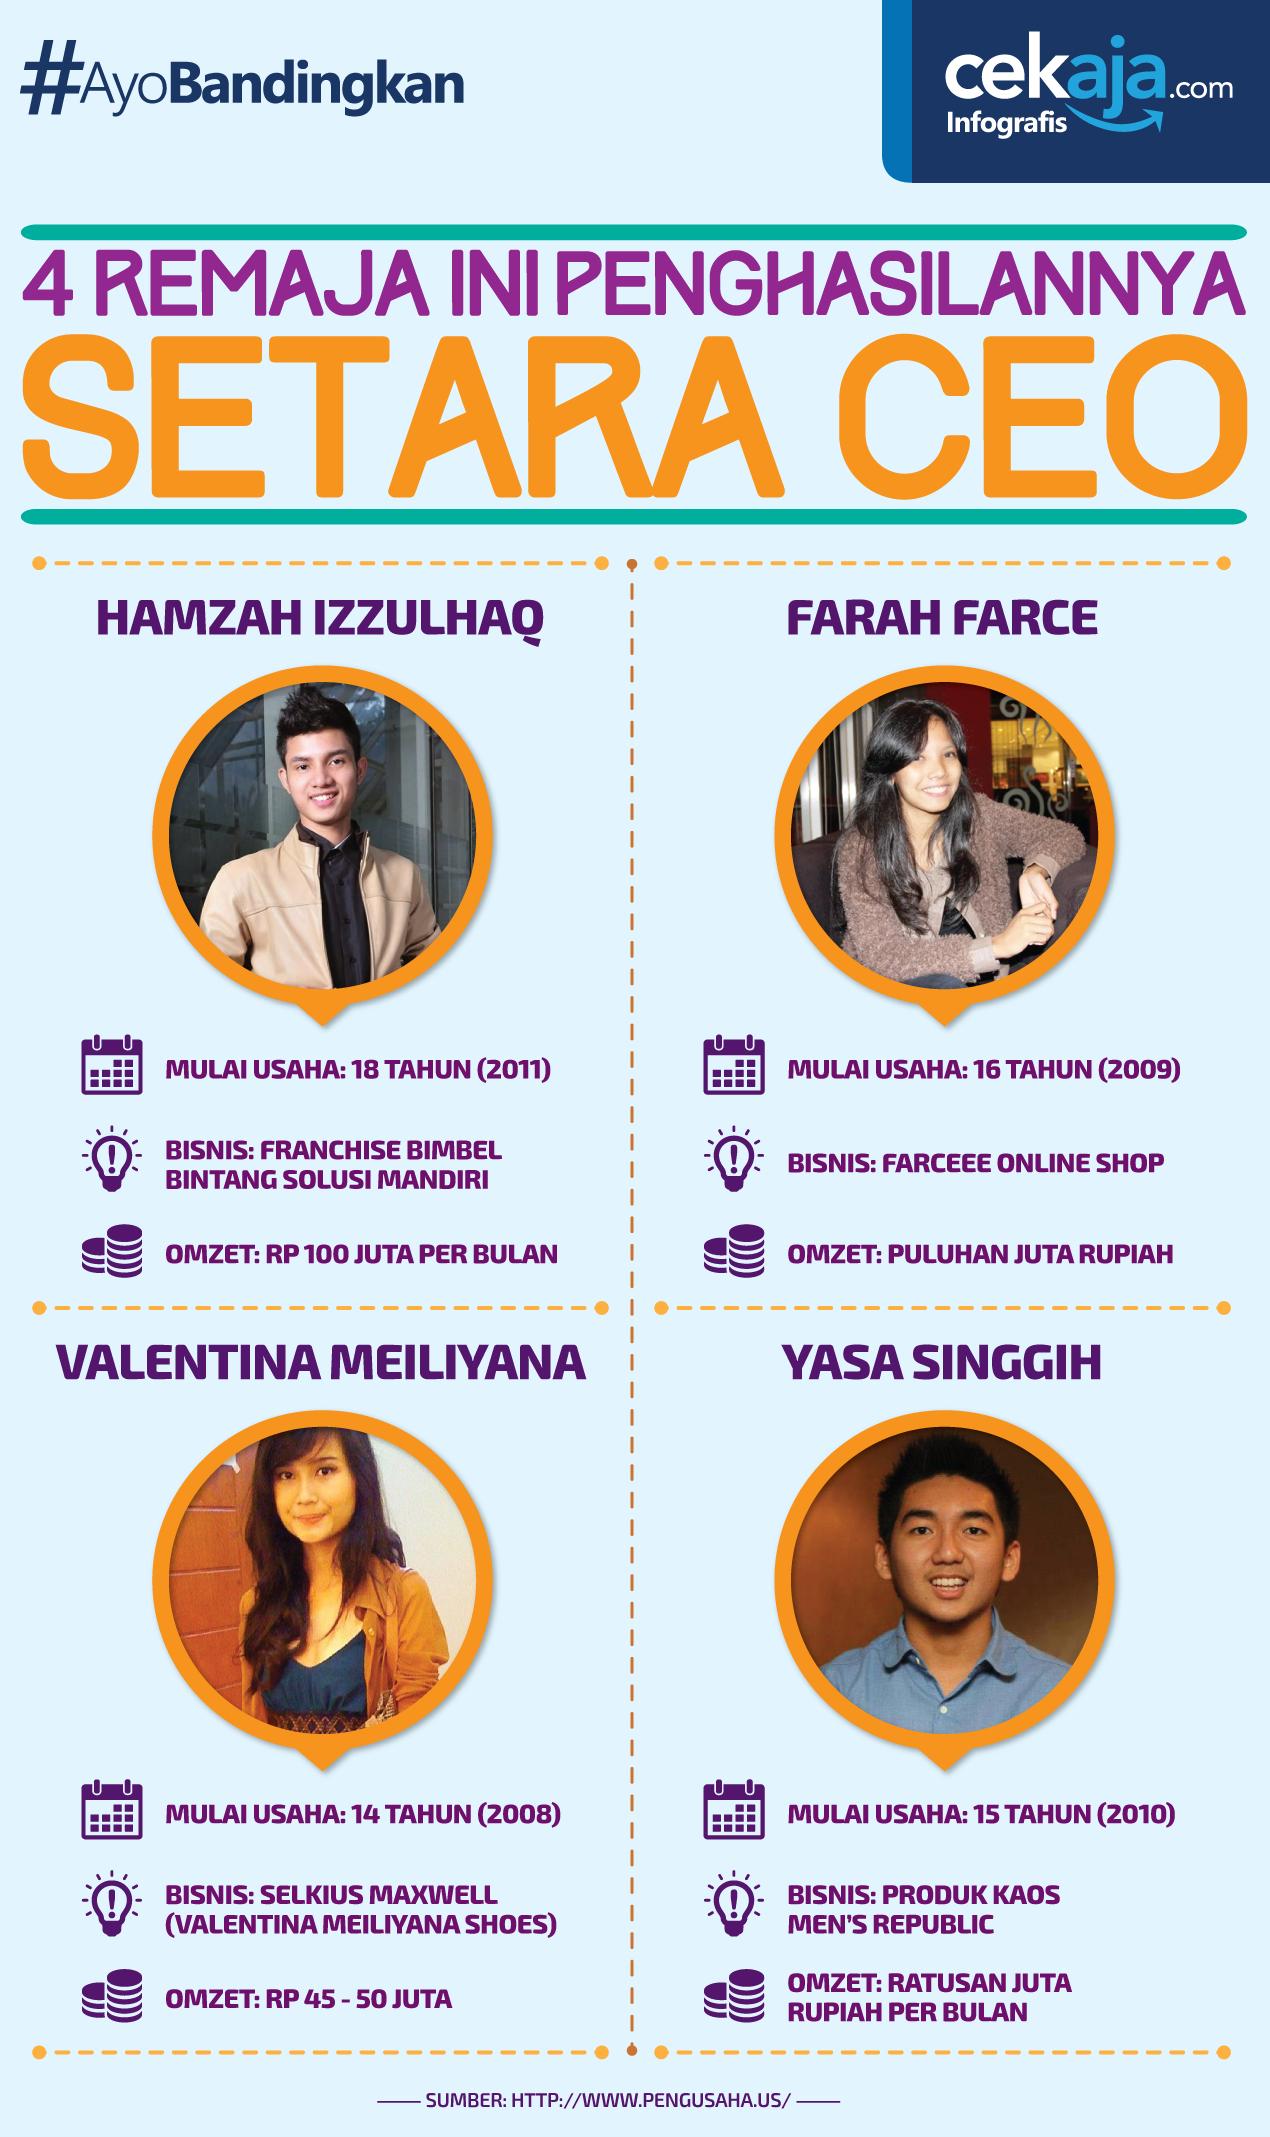 infografis pebisnis remaja sukses-CekAja